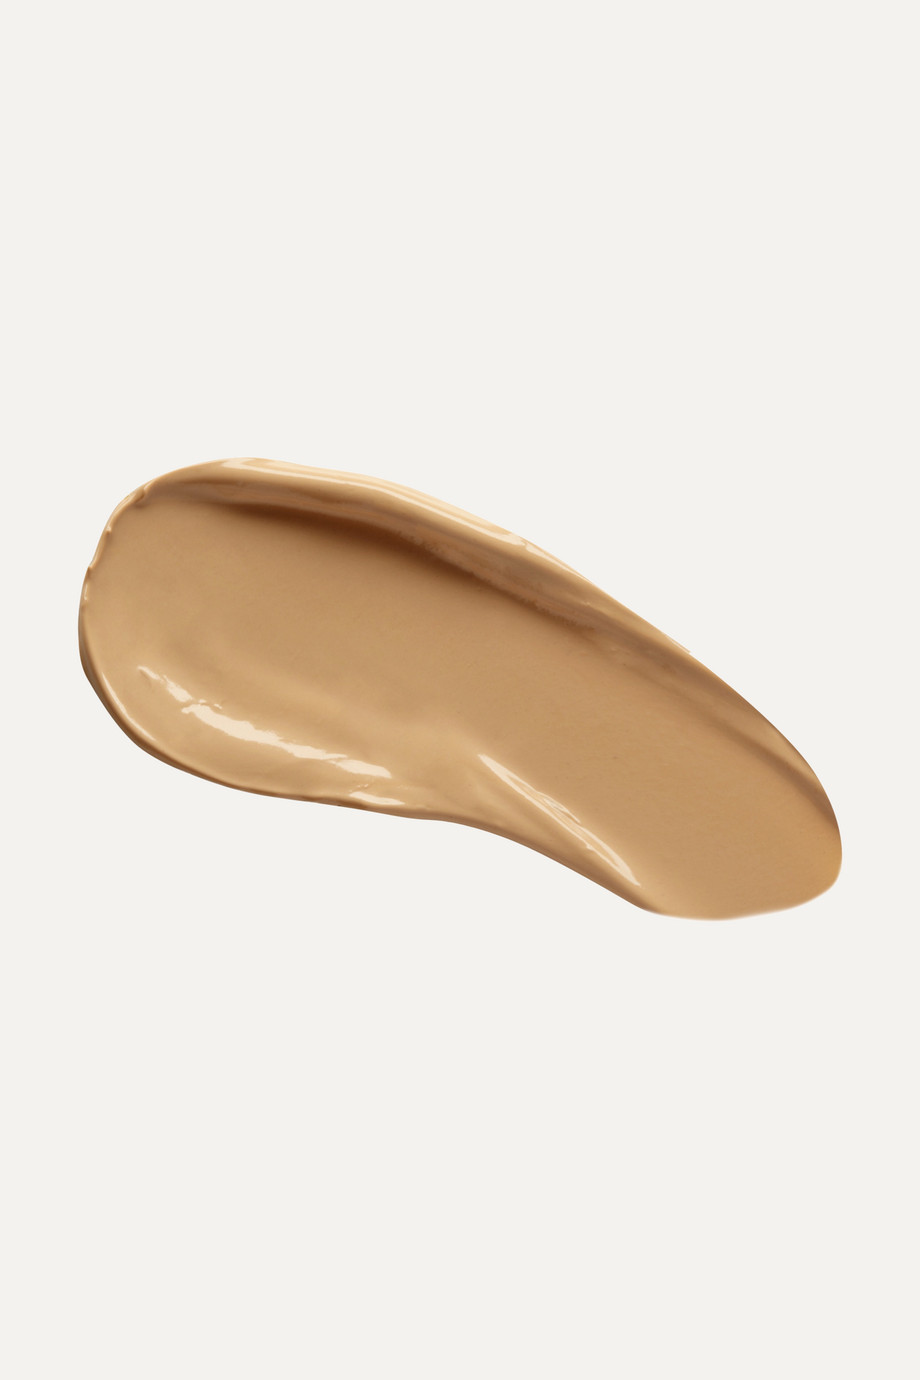 Chantecaille Just Skin Tinted Moisturizer SPF15 - Tan, 50ml